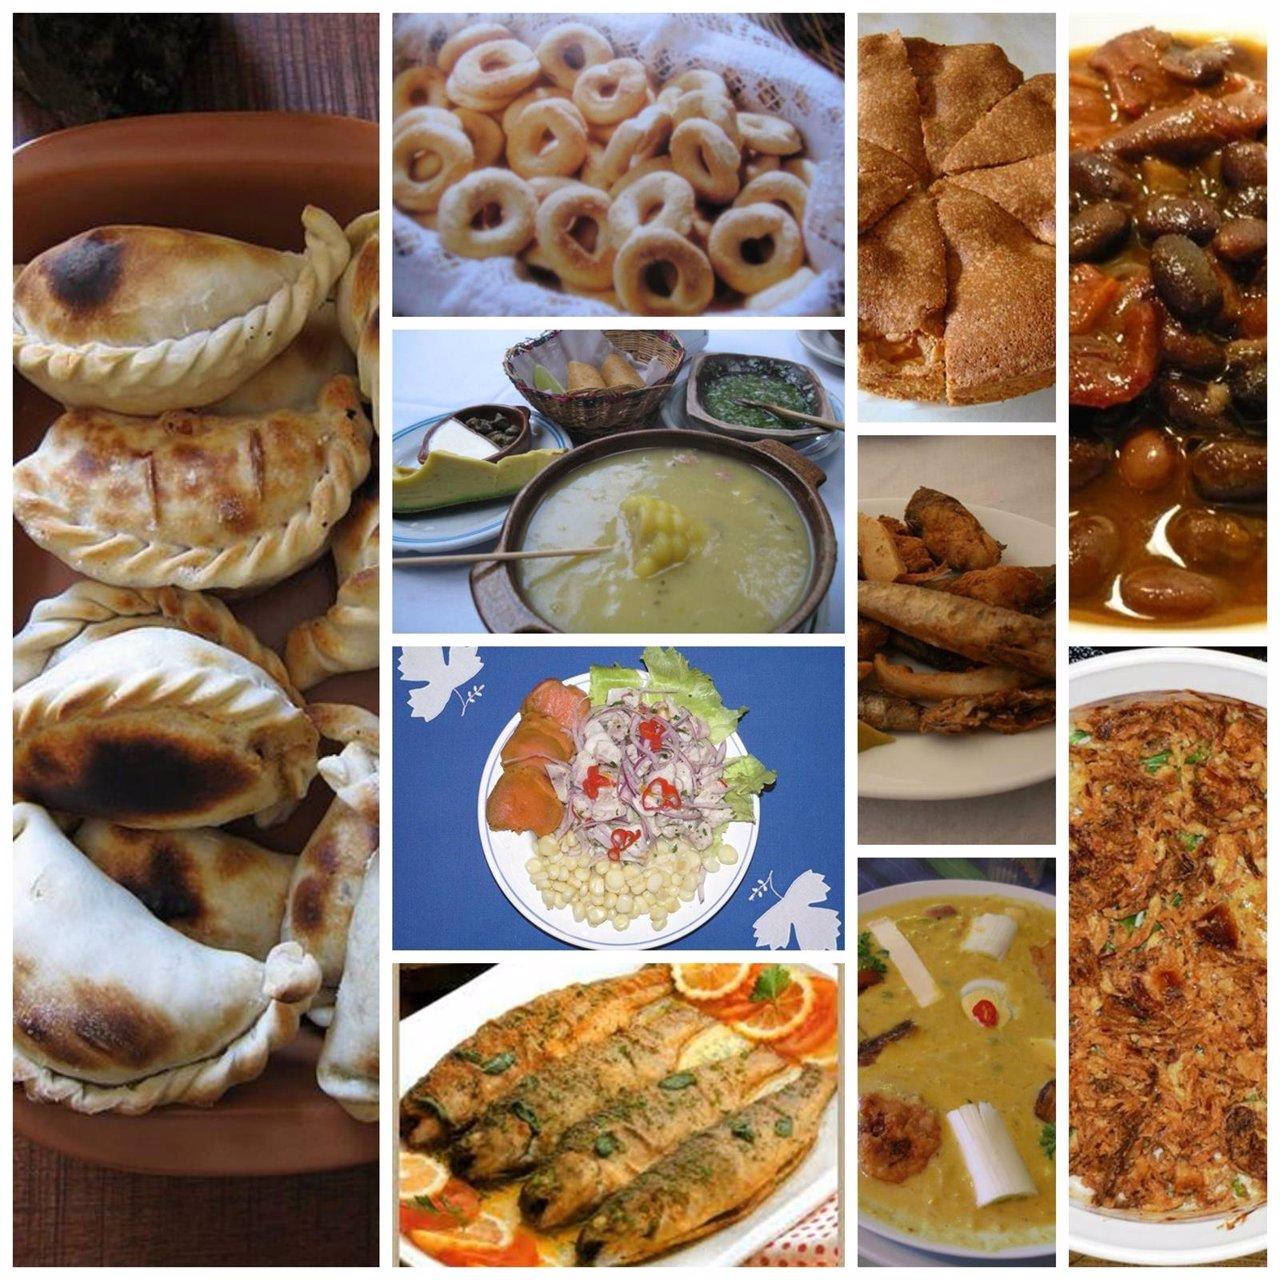 Los platos t picos en la semana santa de iberoam rica for Comida semana santa